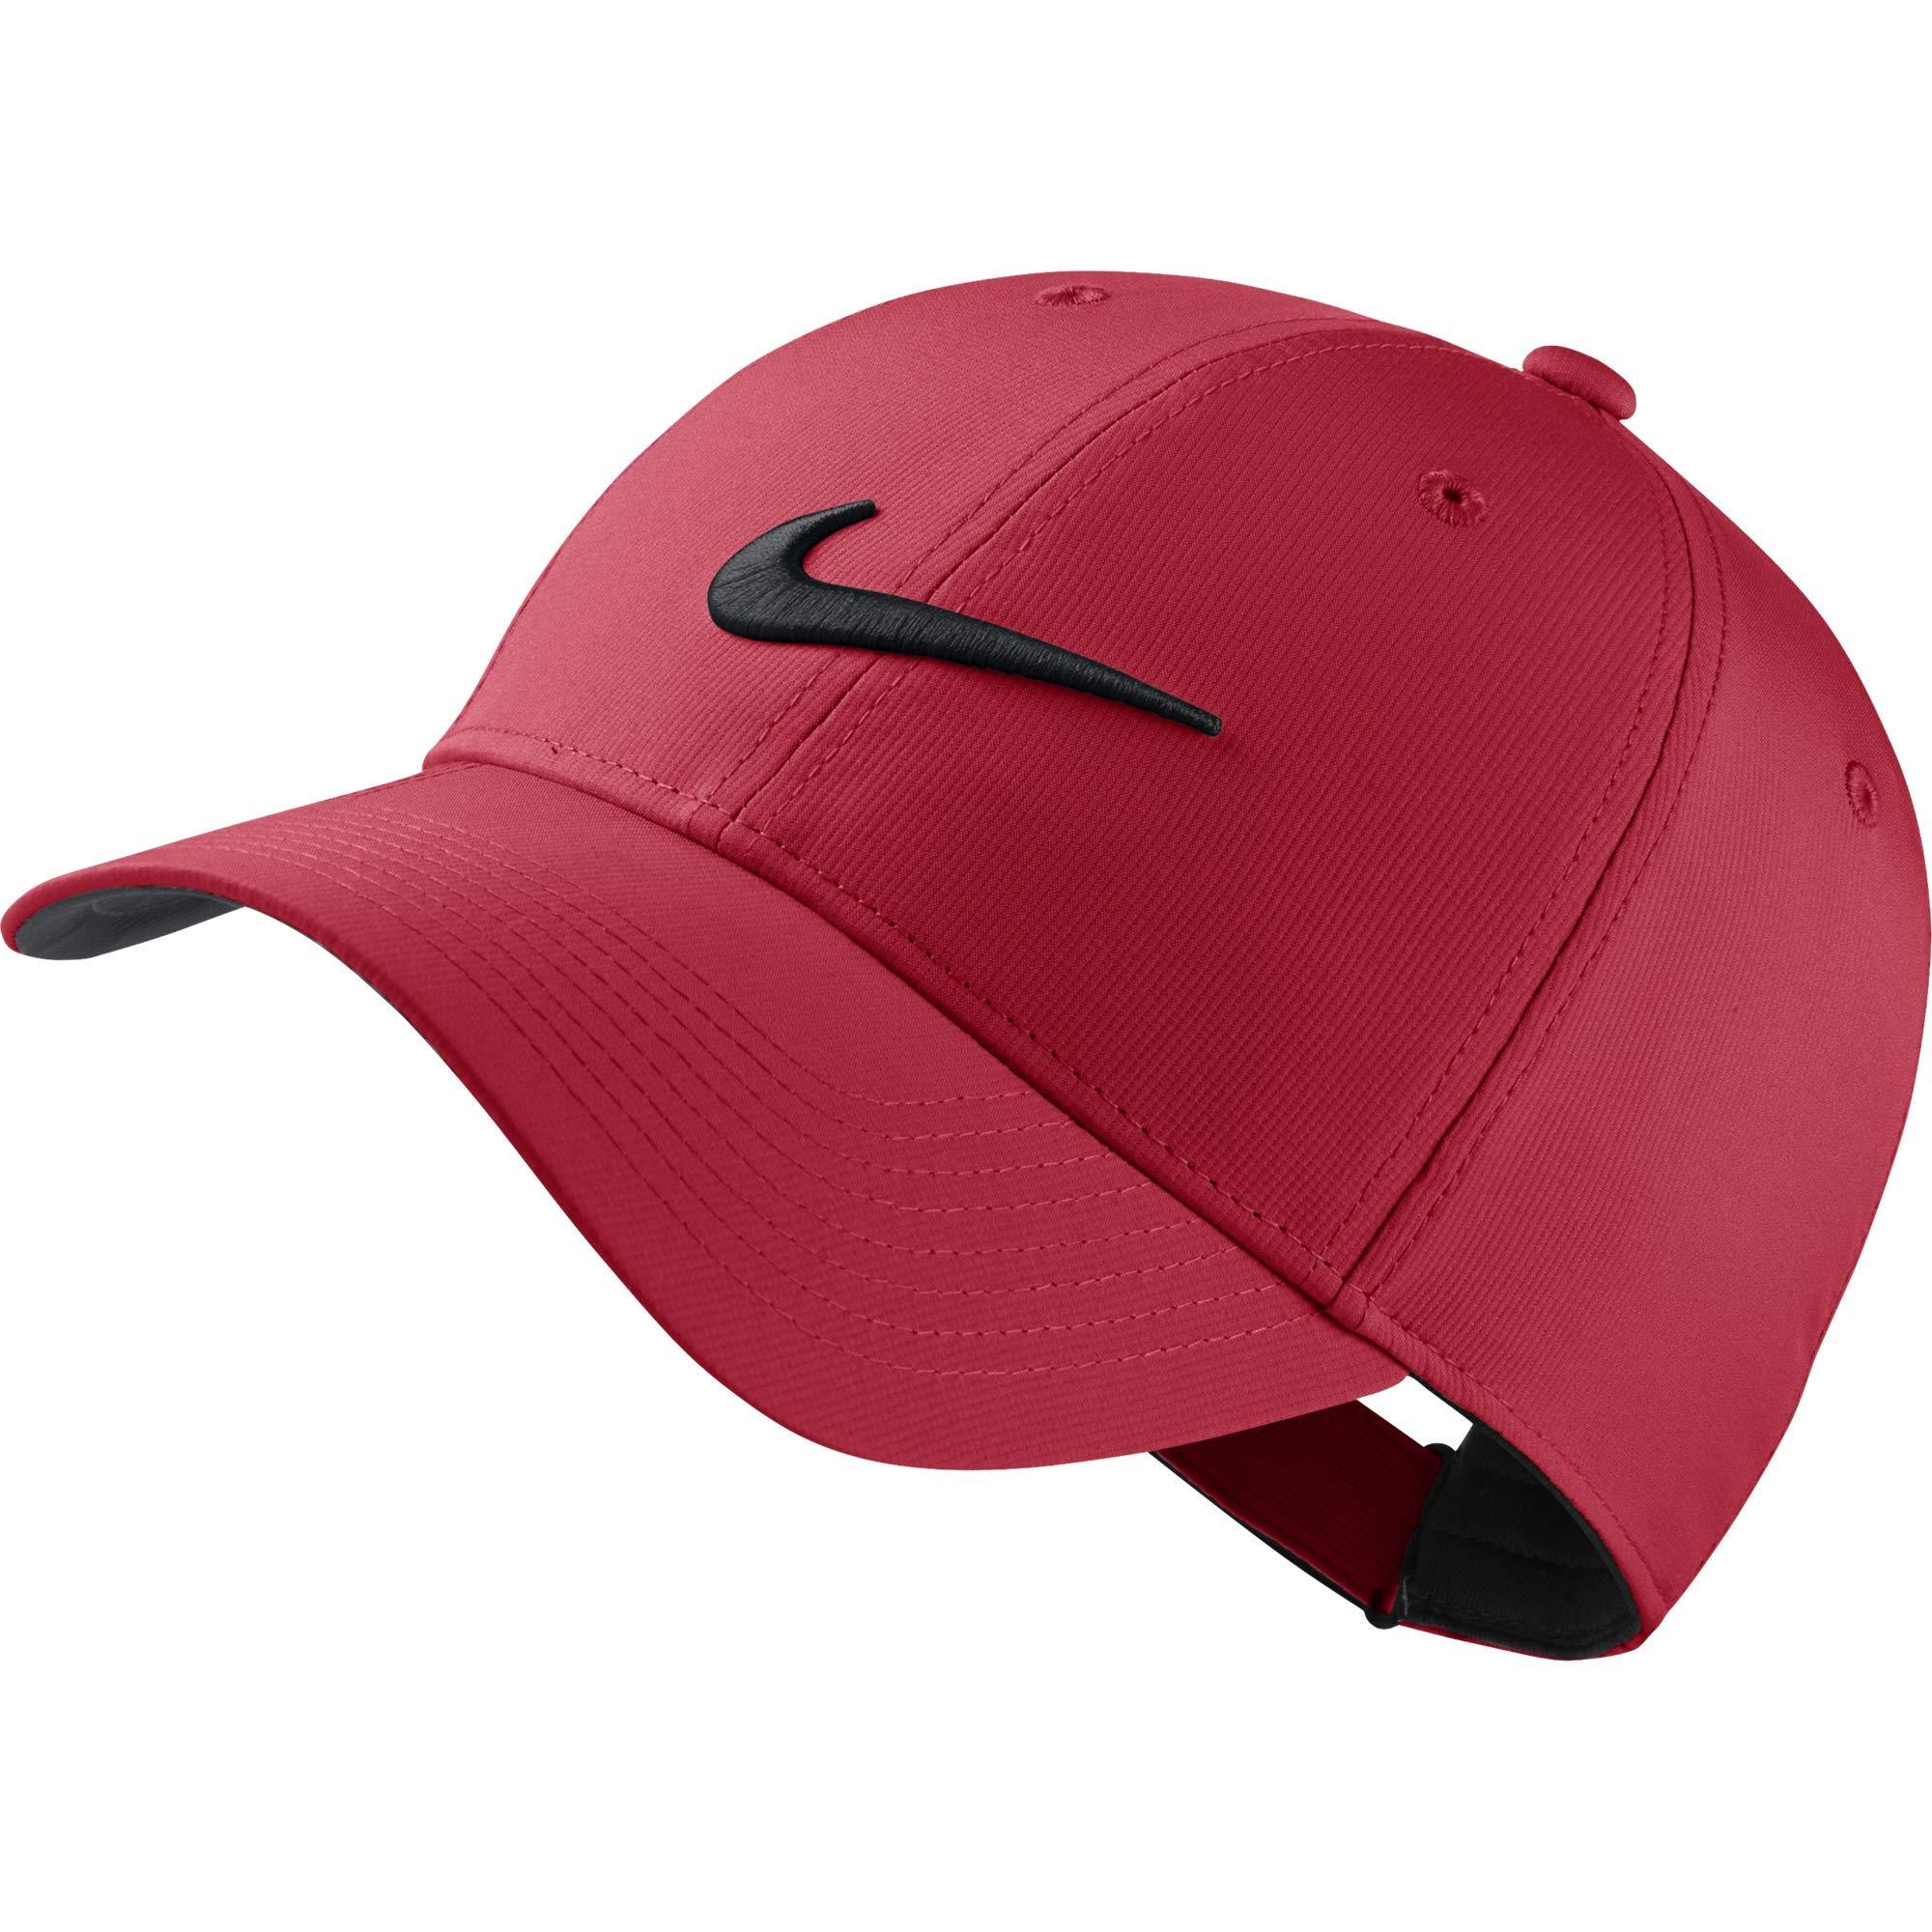 Nike L91 Cap Tech Hat, University Red/Anthracite/Black, Misc